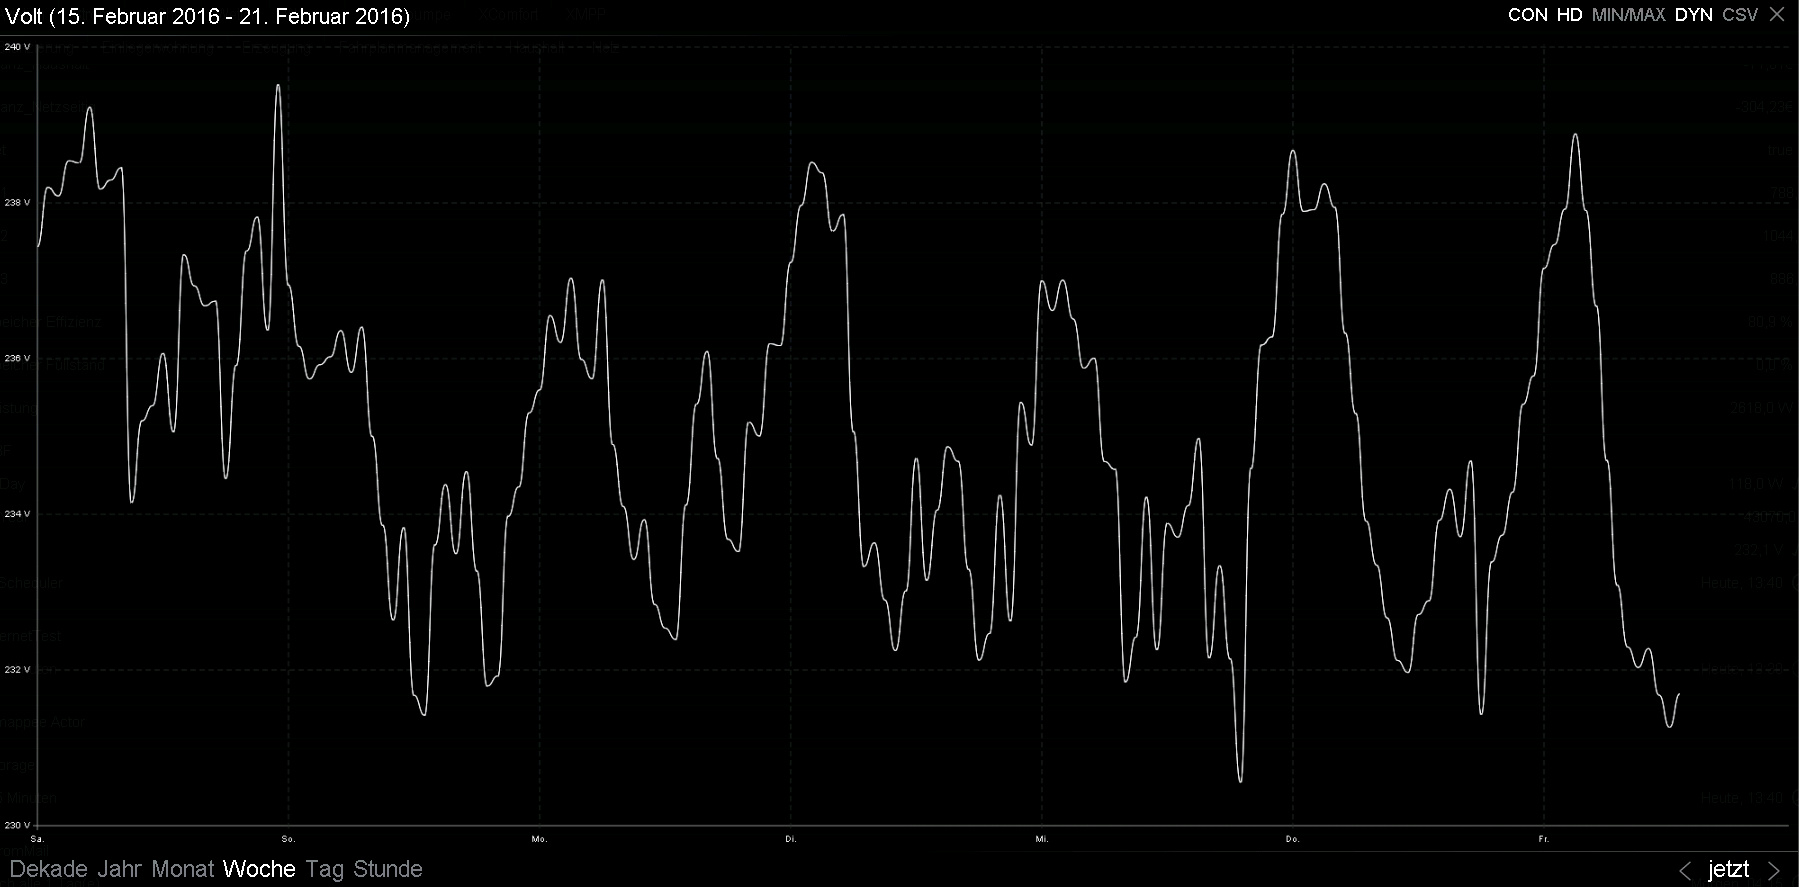 Spannungsniveau - 1 Phase - Niederspannung (Syna Netz)